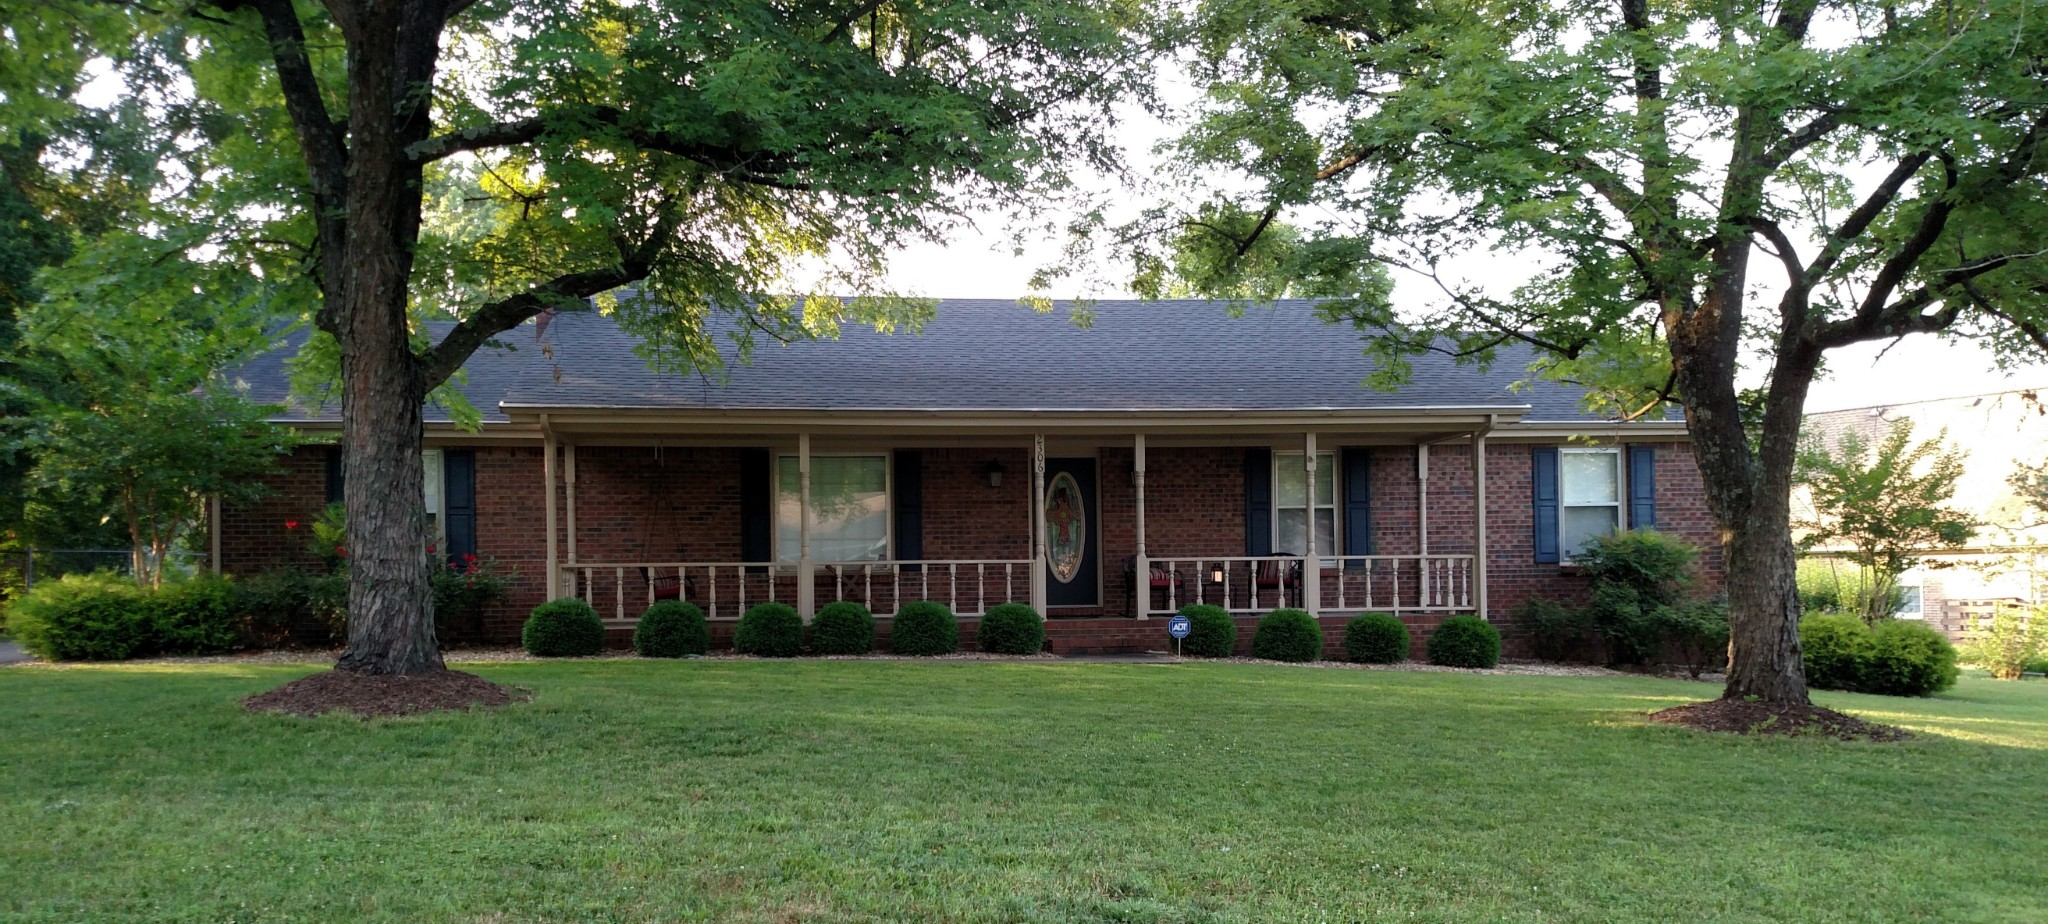 2306 Avenal Ct Property Photo - Murfreesboro, TN real estate listing